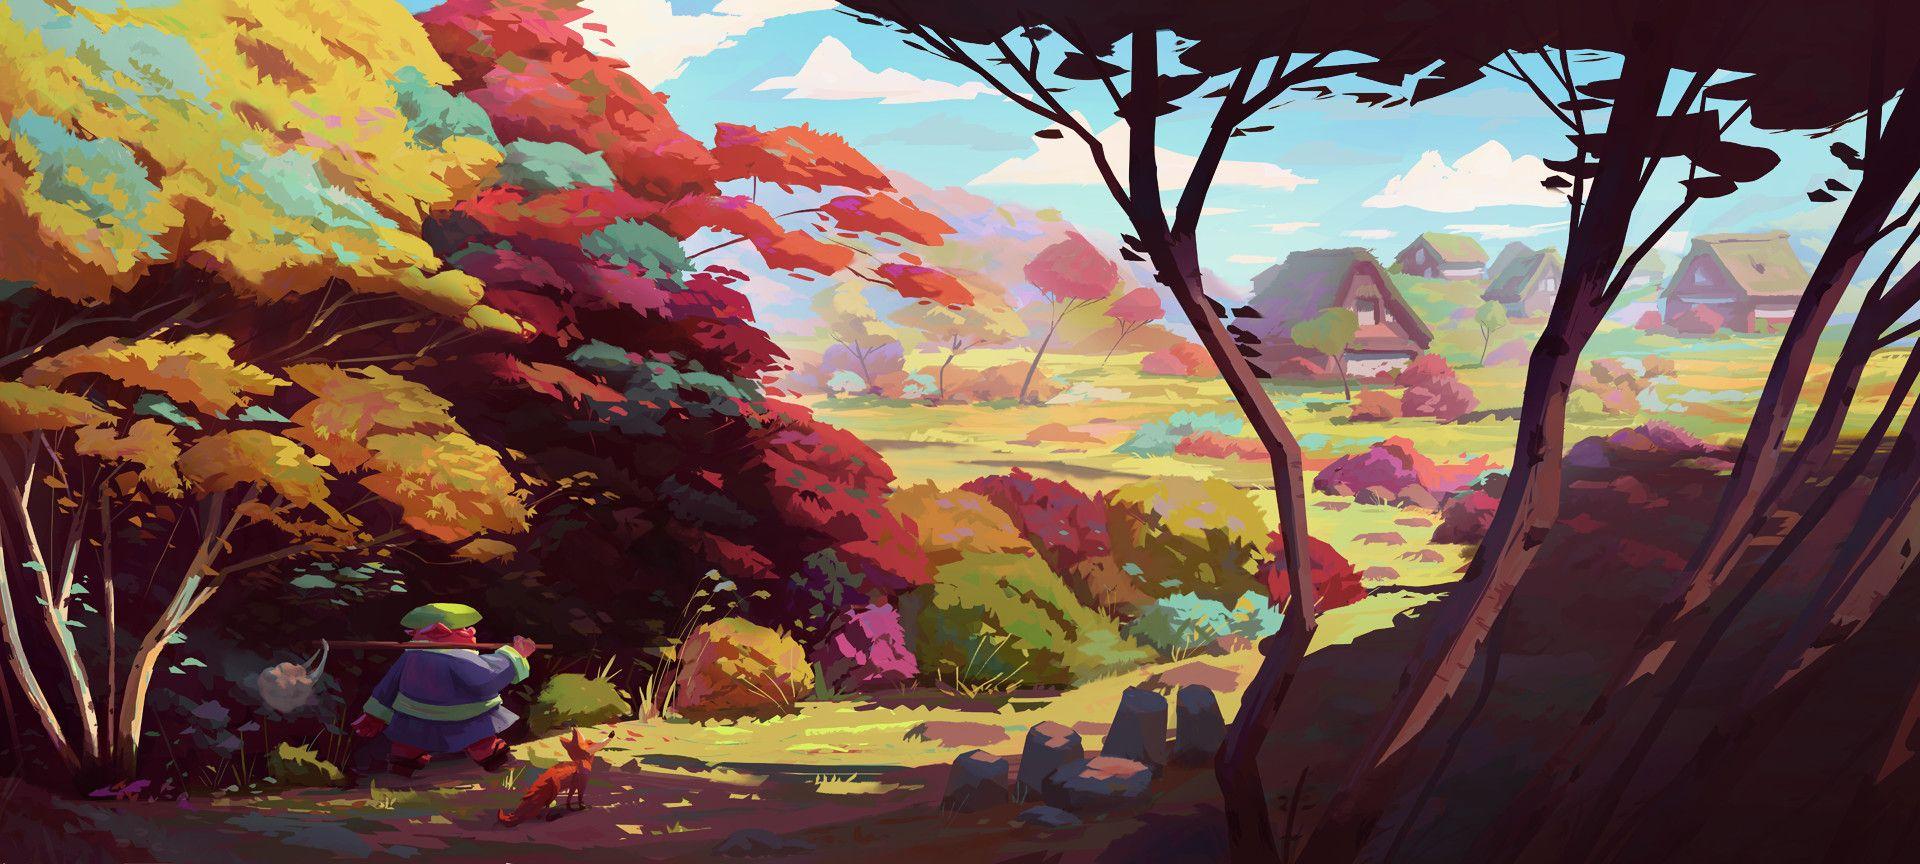 Artstation Autumn Leaves Slawek Fedorczuk Landscape Concept Landscape Art Animation Art